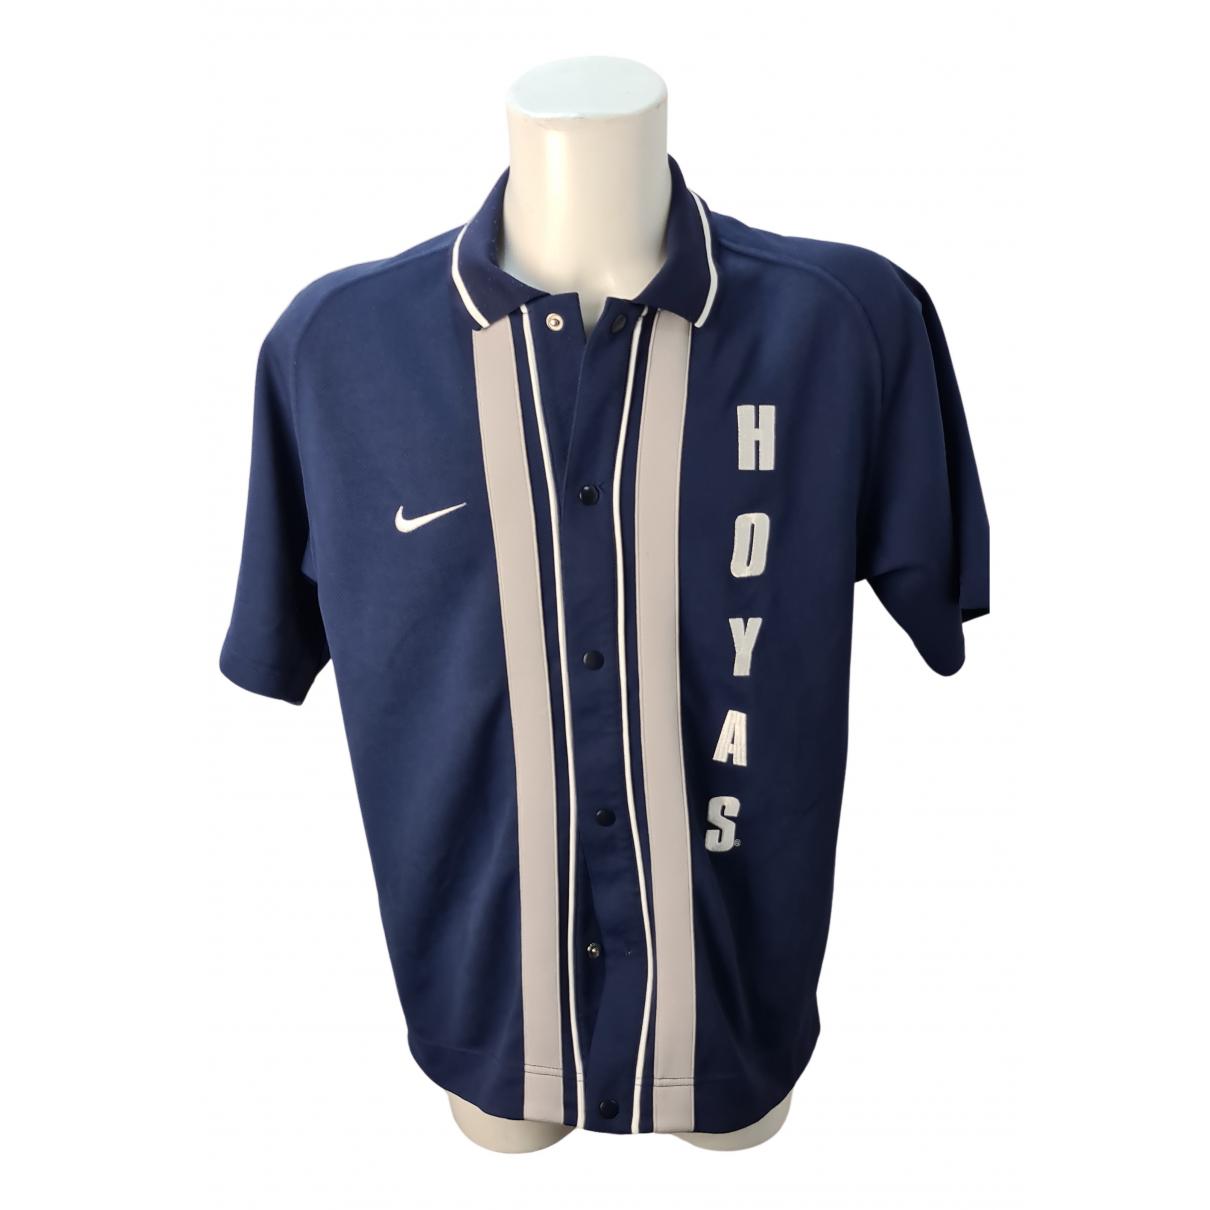 Nike N Blue Shirts for Men S International